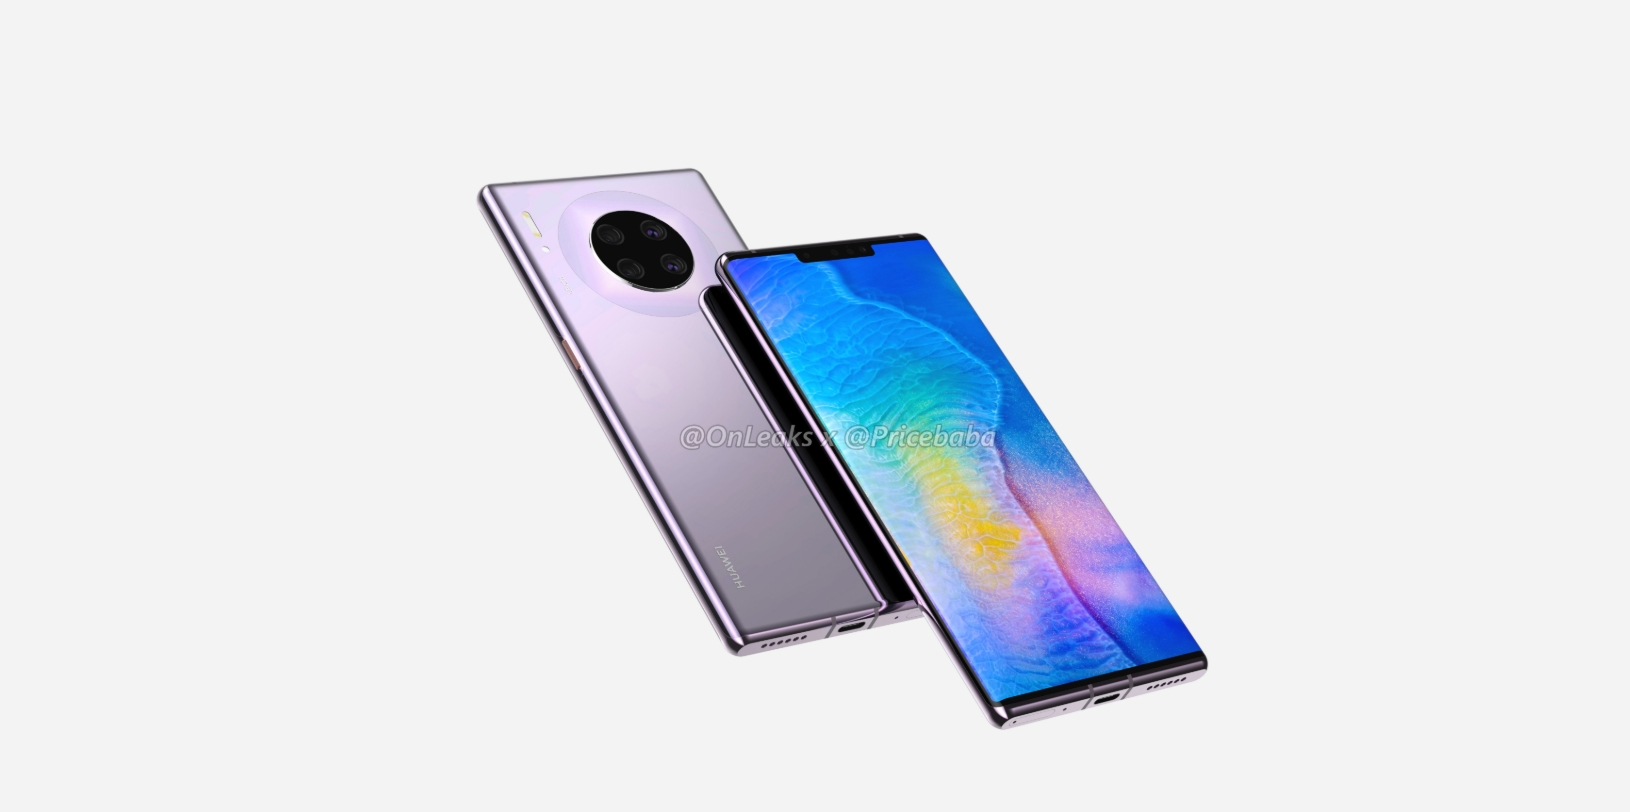 Potvrzeno: série Huawei Mate 30 bude bez Google aplikací a služeb